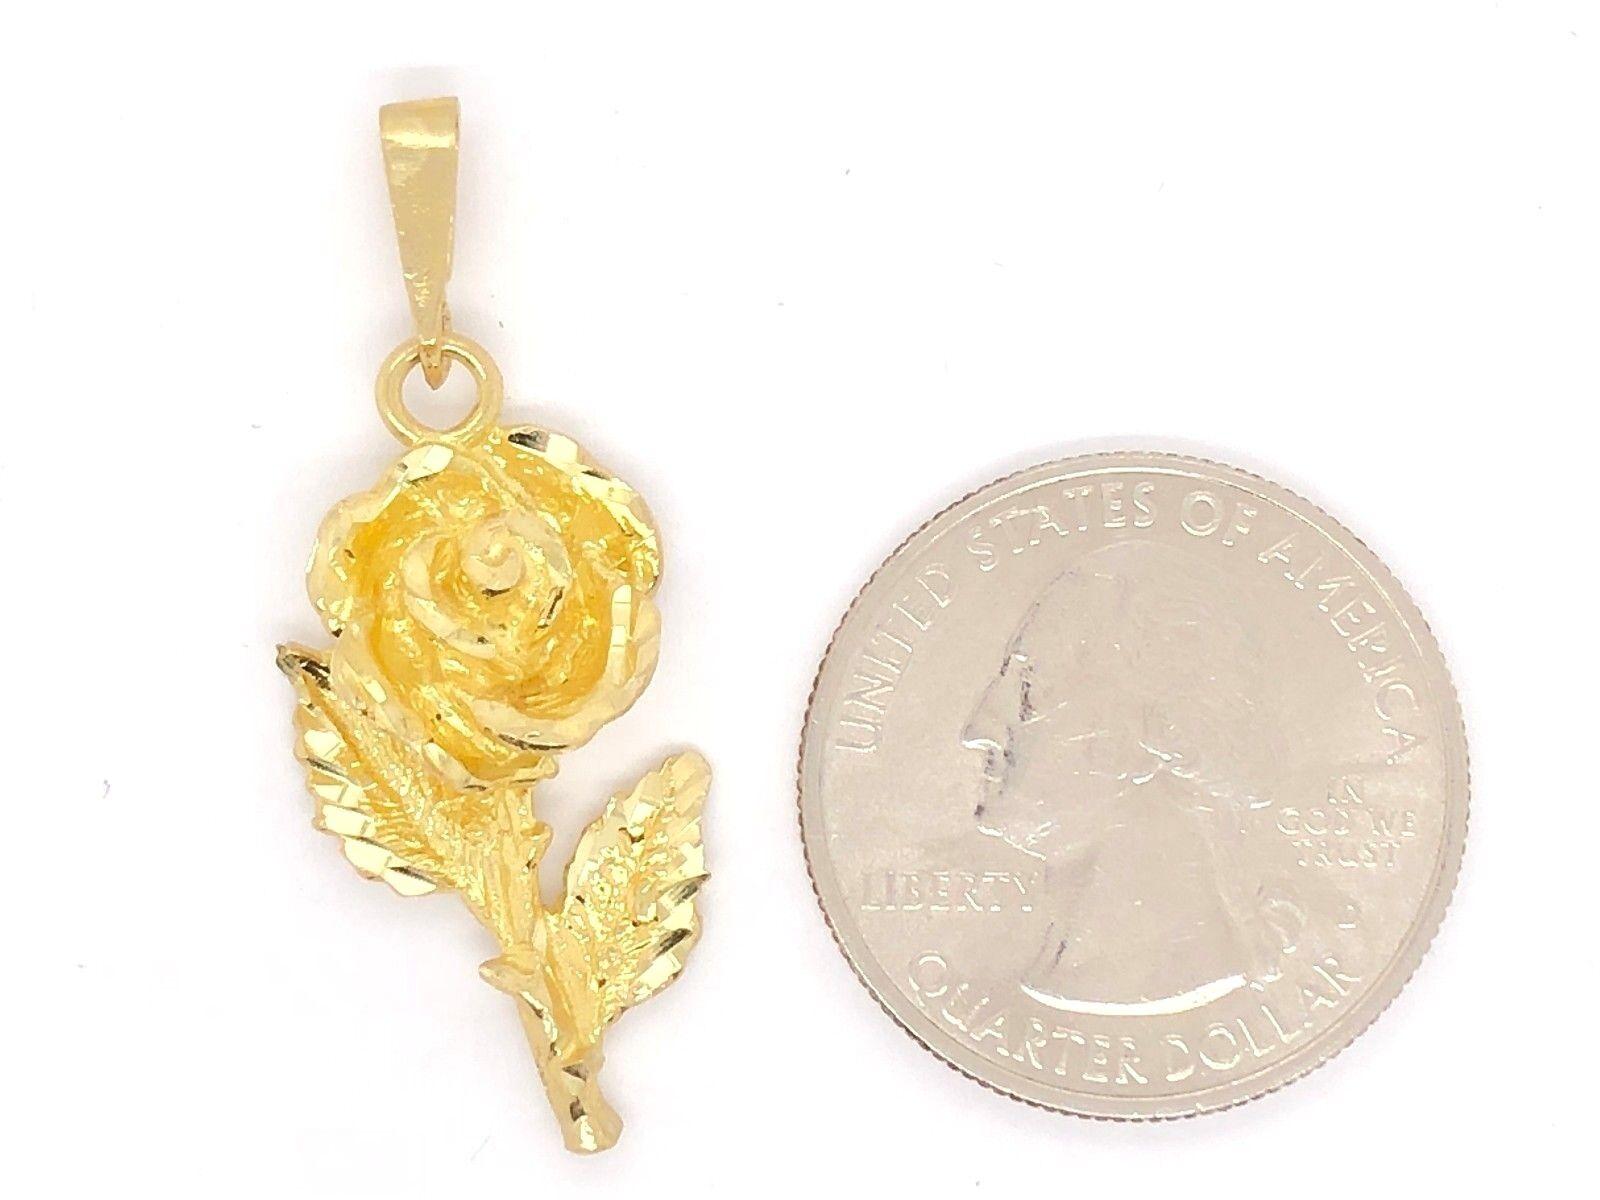 10k Yellow Gold Solid 3D Diamond-Cut Rose Flower Charm Pendant 3.2g